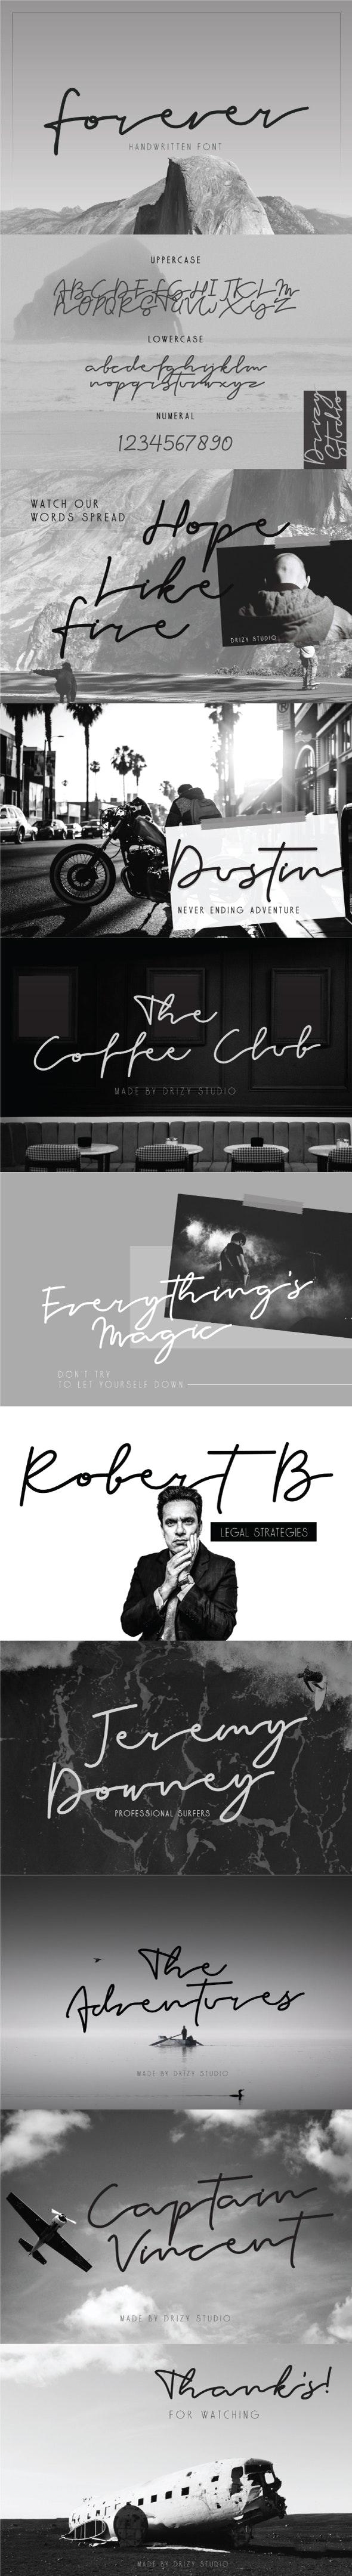 Forever Handwritten Typeface - Hand-writing Script